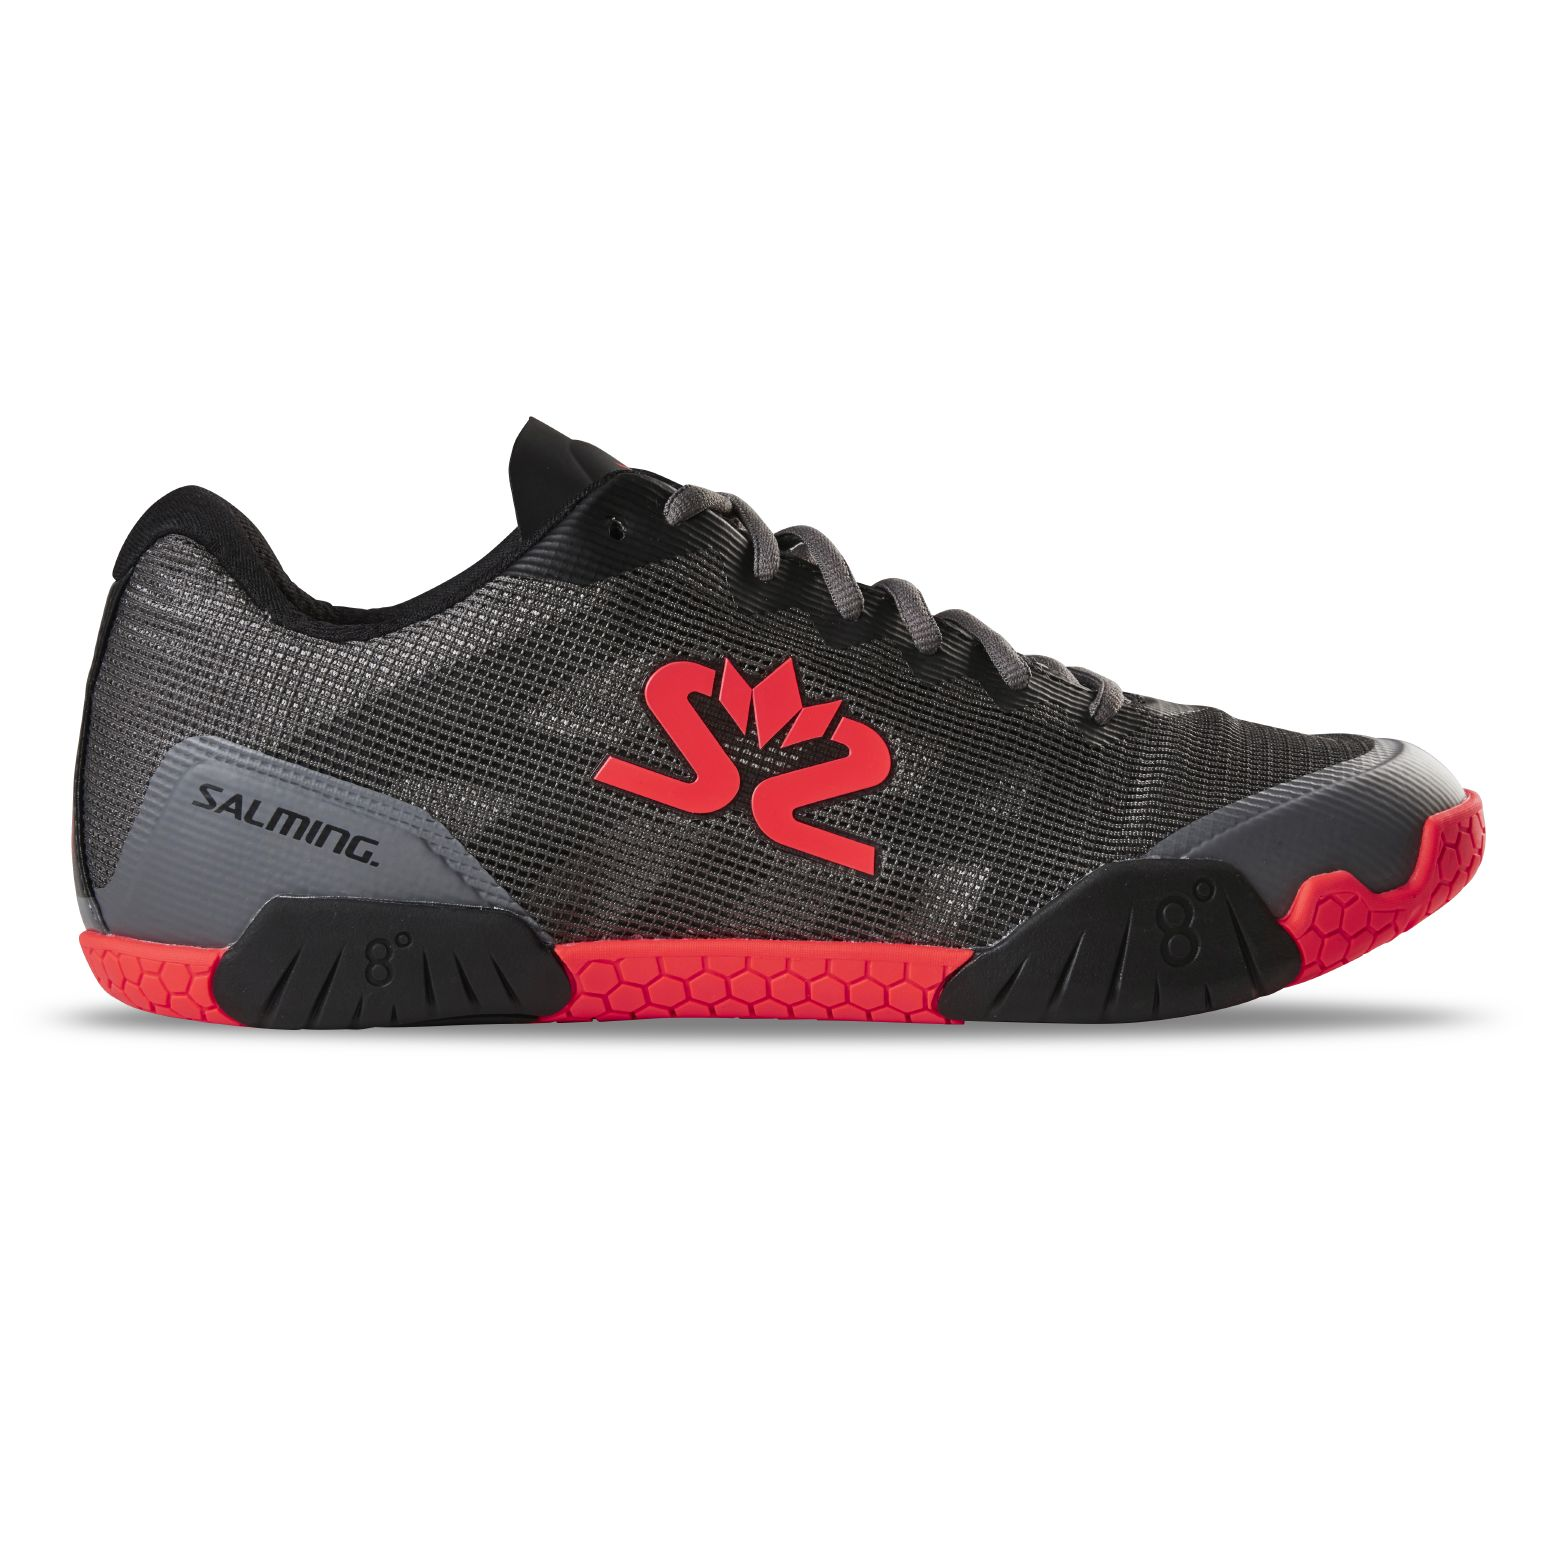 Salming Hawk Shoe Men GunMetal/Red 9 UK - 44 EUR - 28 cm